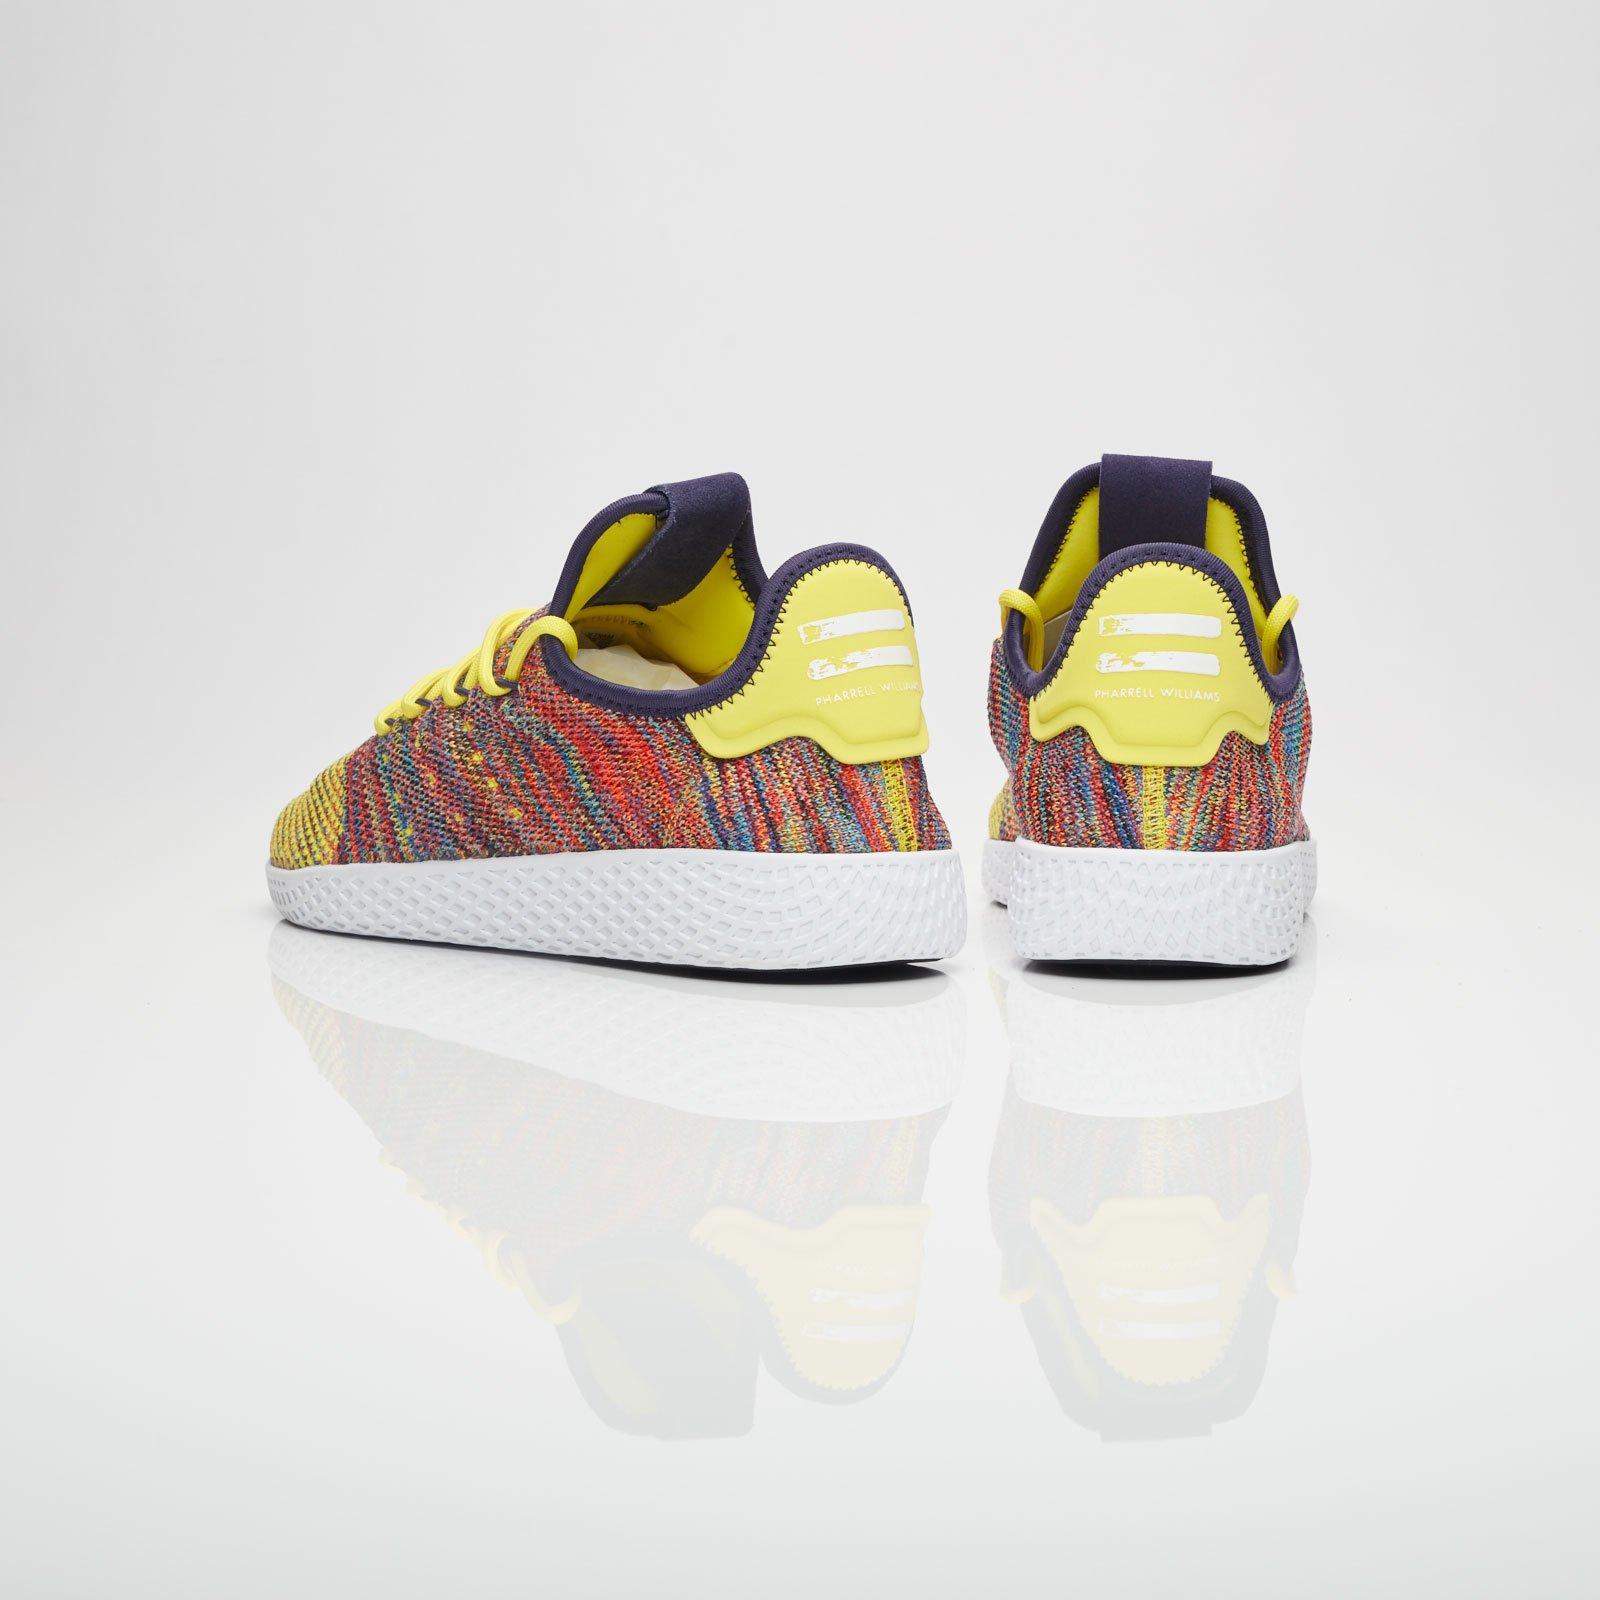 76f21b855 adidas PW Tennis HU - By2673 - Sneakersnstuff